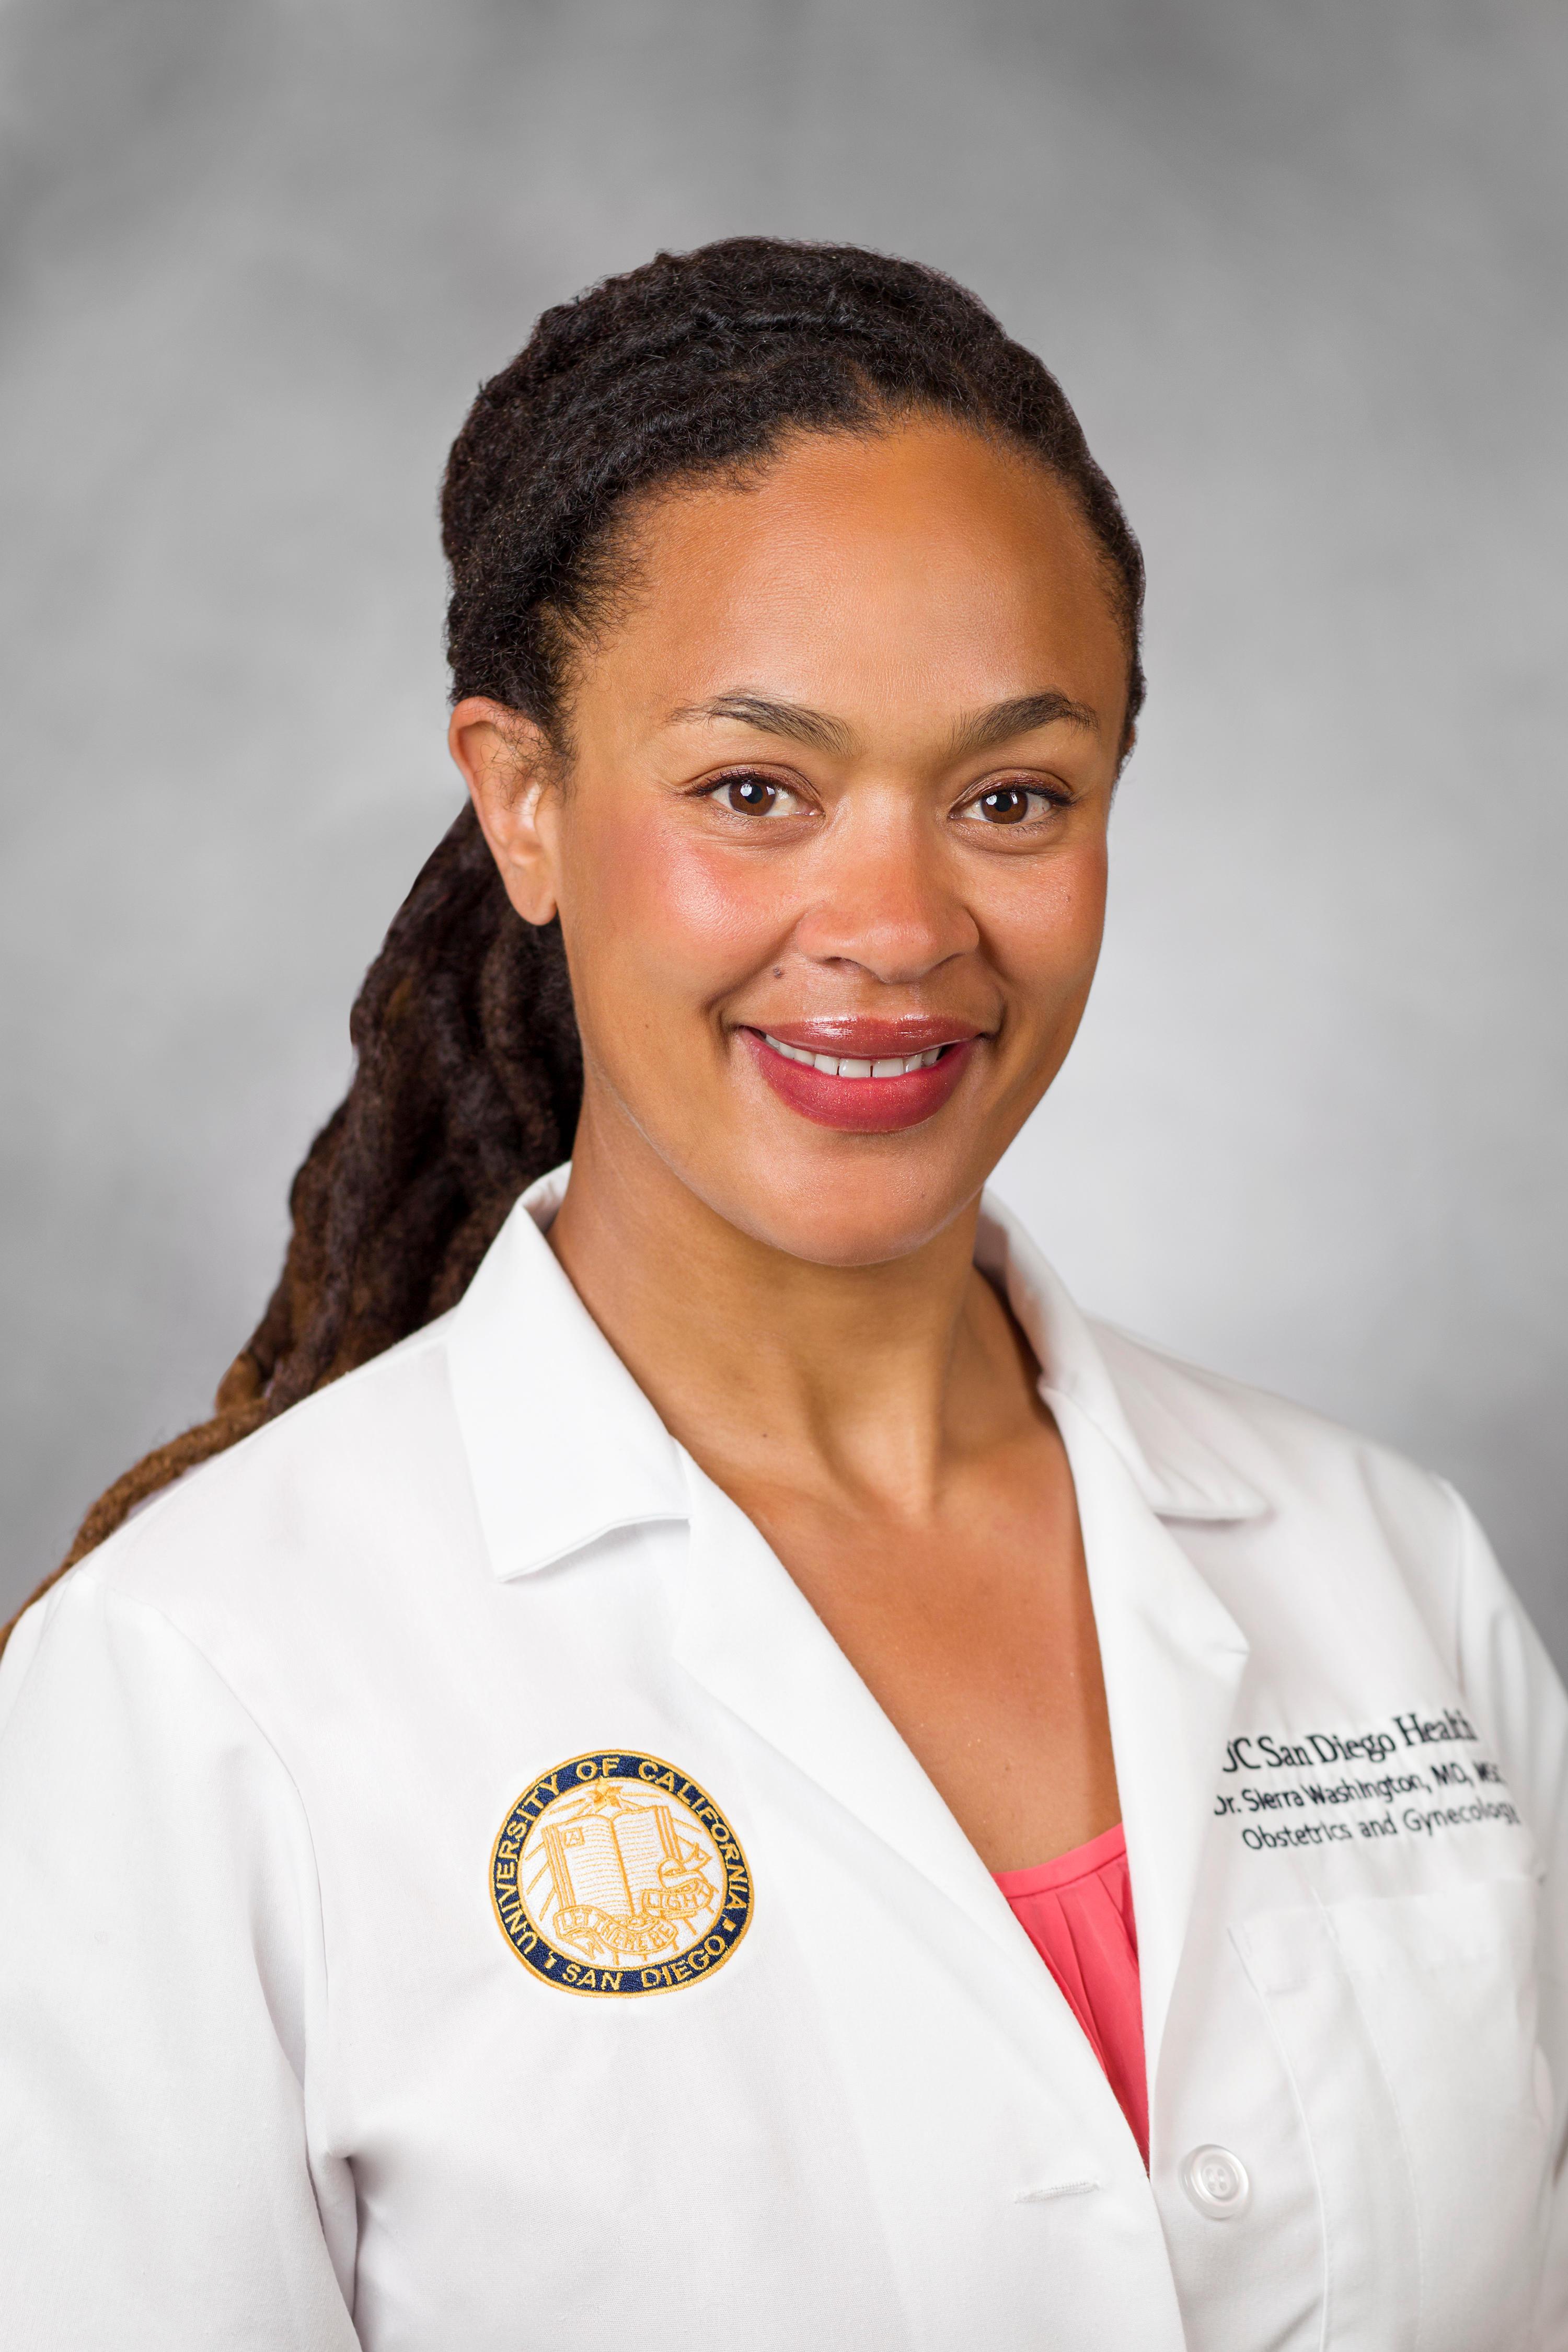 Image For Dr. Sierra  Washington MD